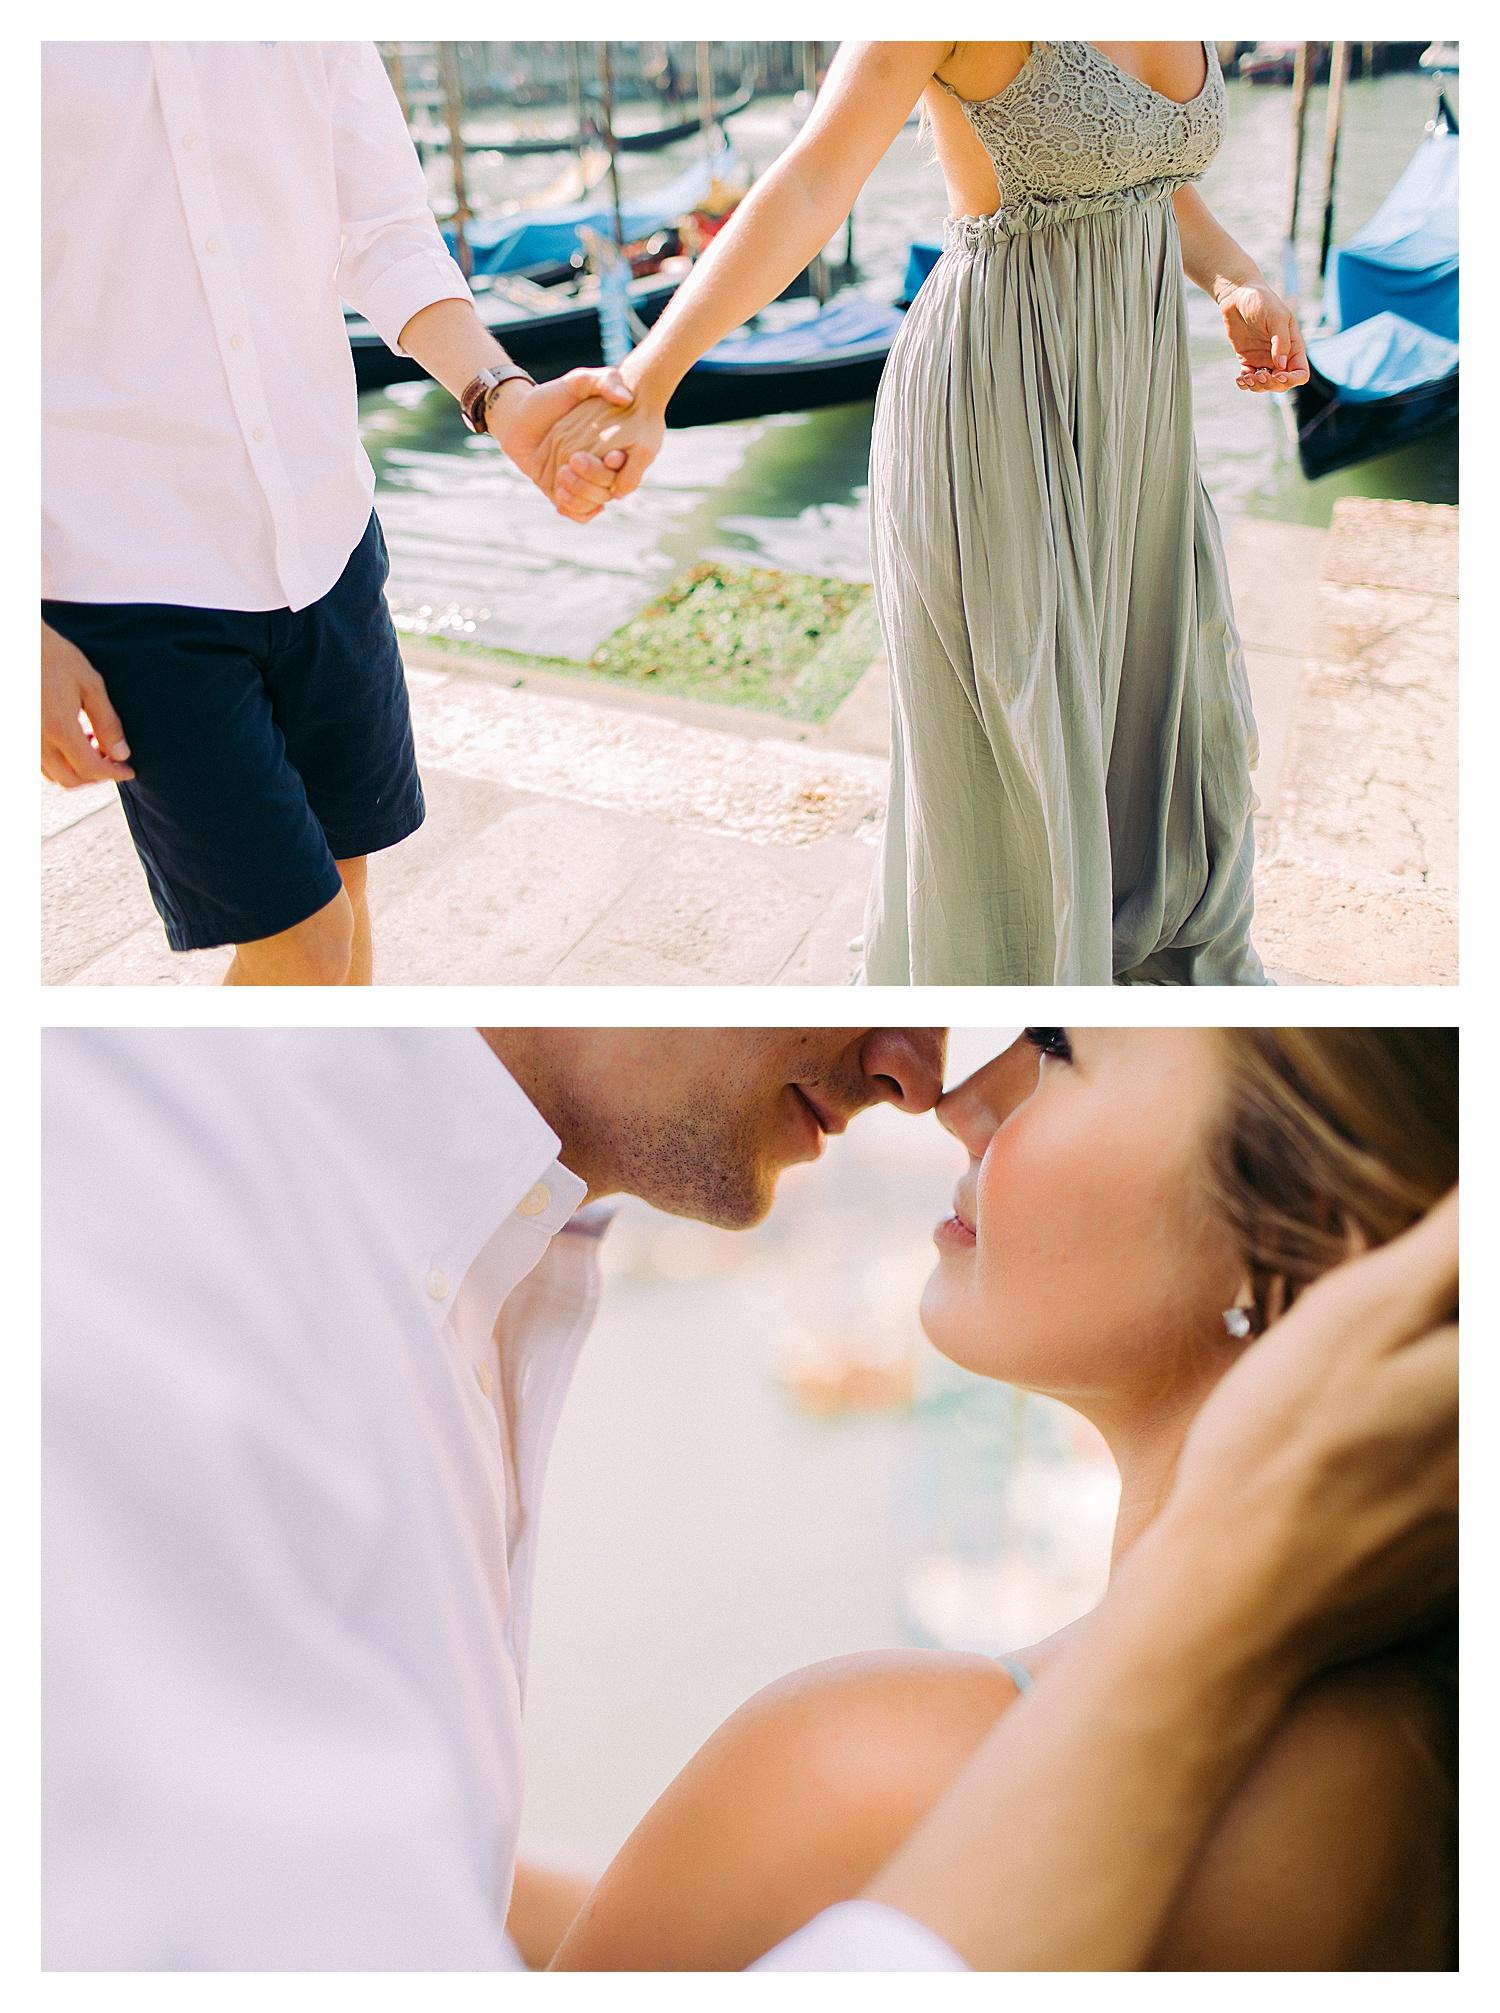 VENICE-COUPLE-PHOTOSHOOT-film-stefano-degirmenci_0557.jpg